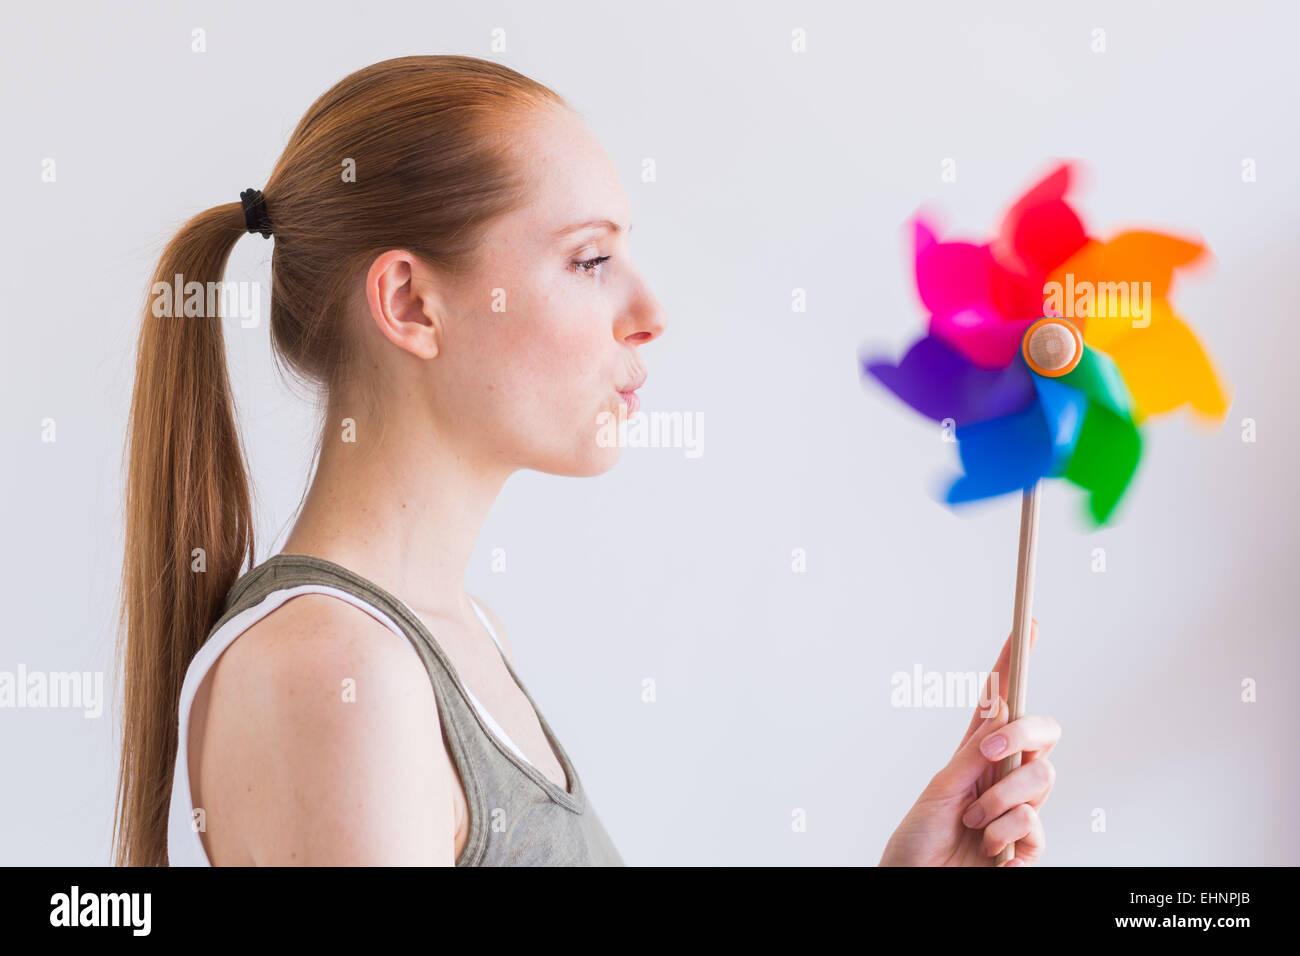 Imagen conceptual de aliento. Imagen De Stock